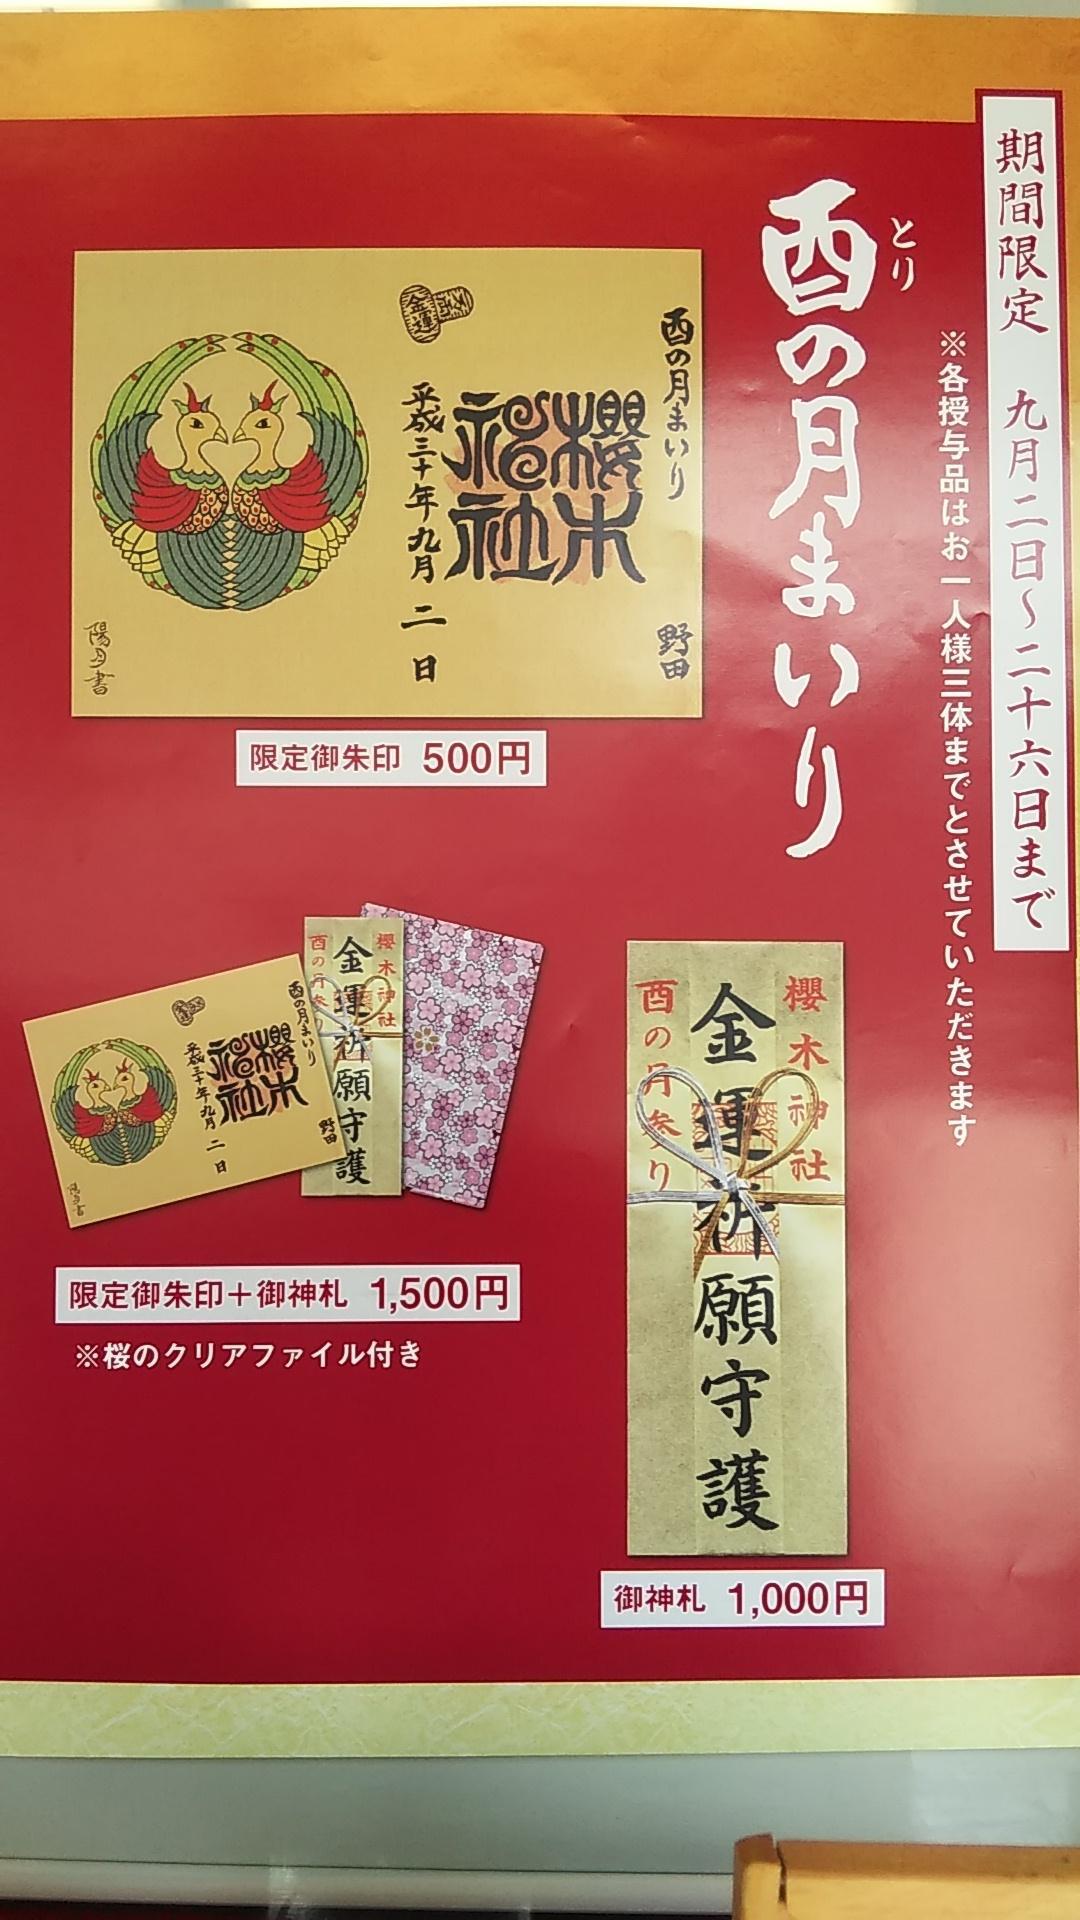 櫻木神社の境内・文化財